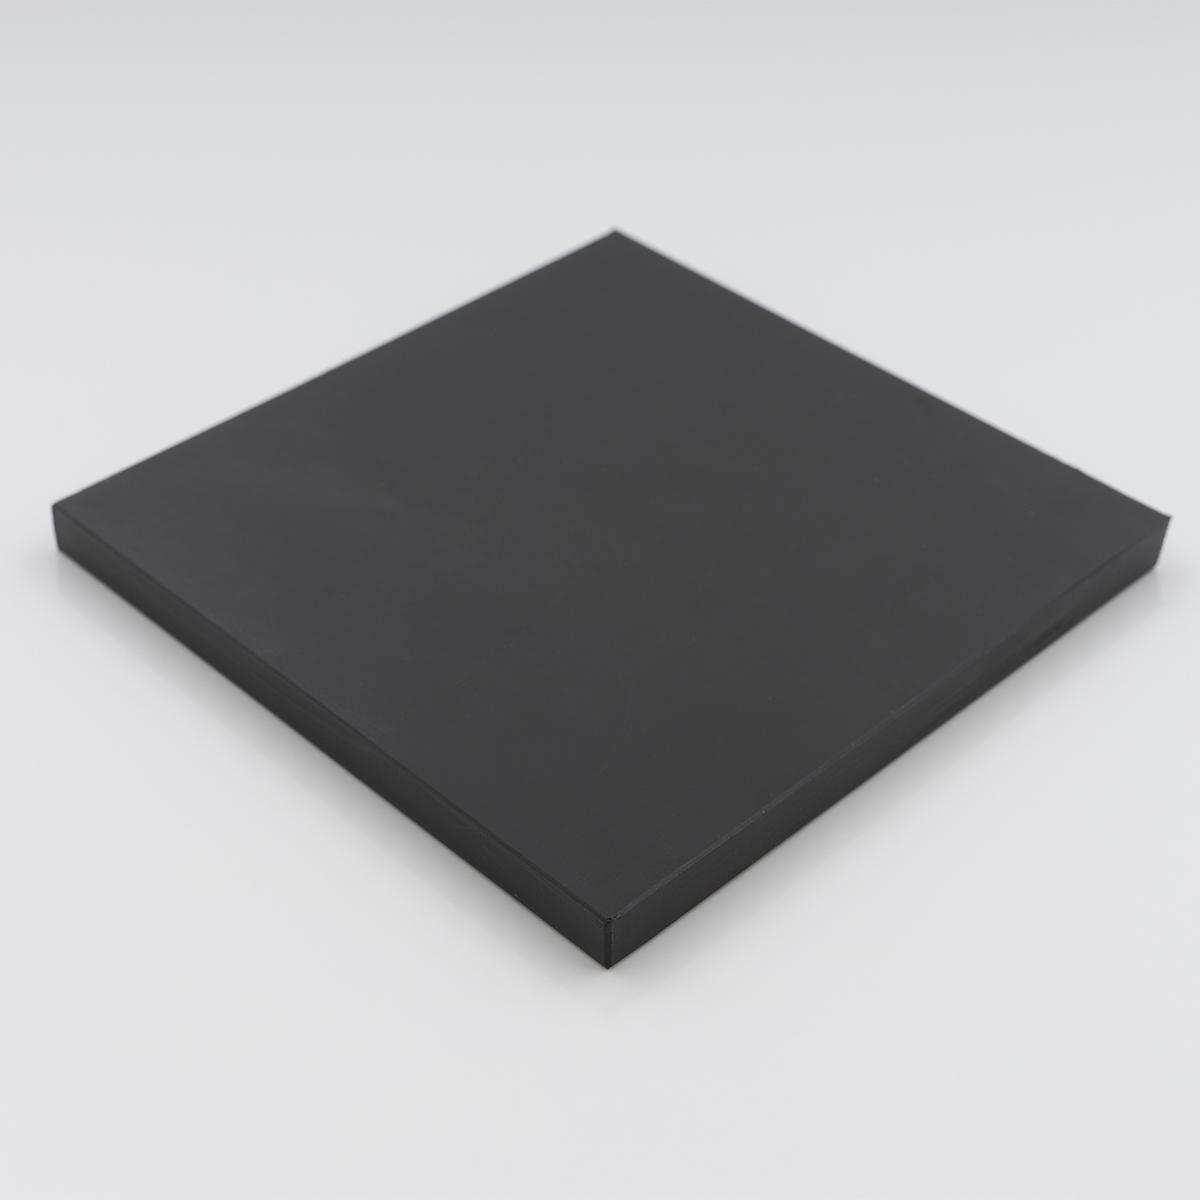 Black High Density Polyethylene Sheet